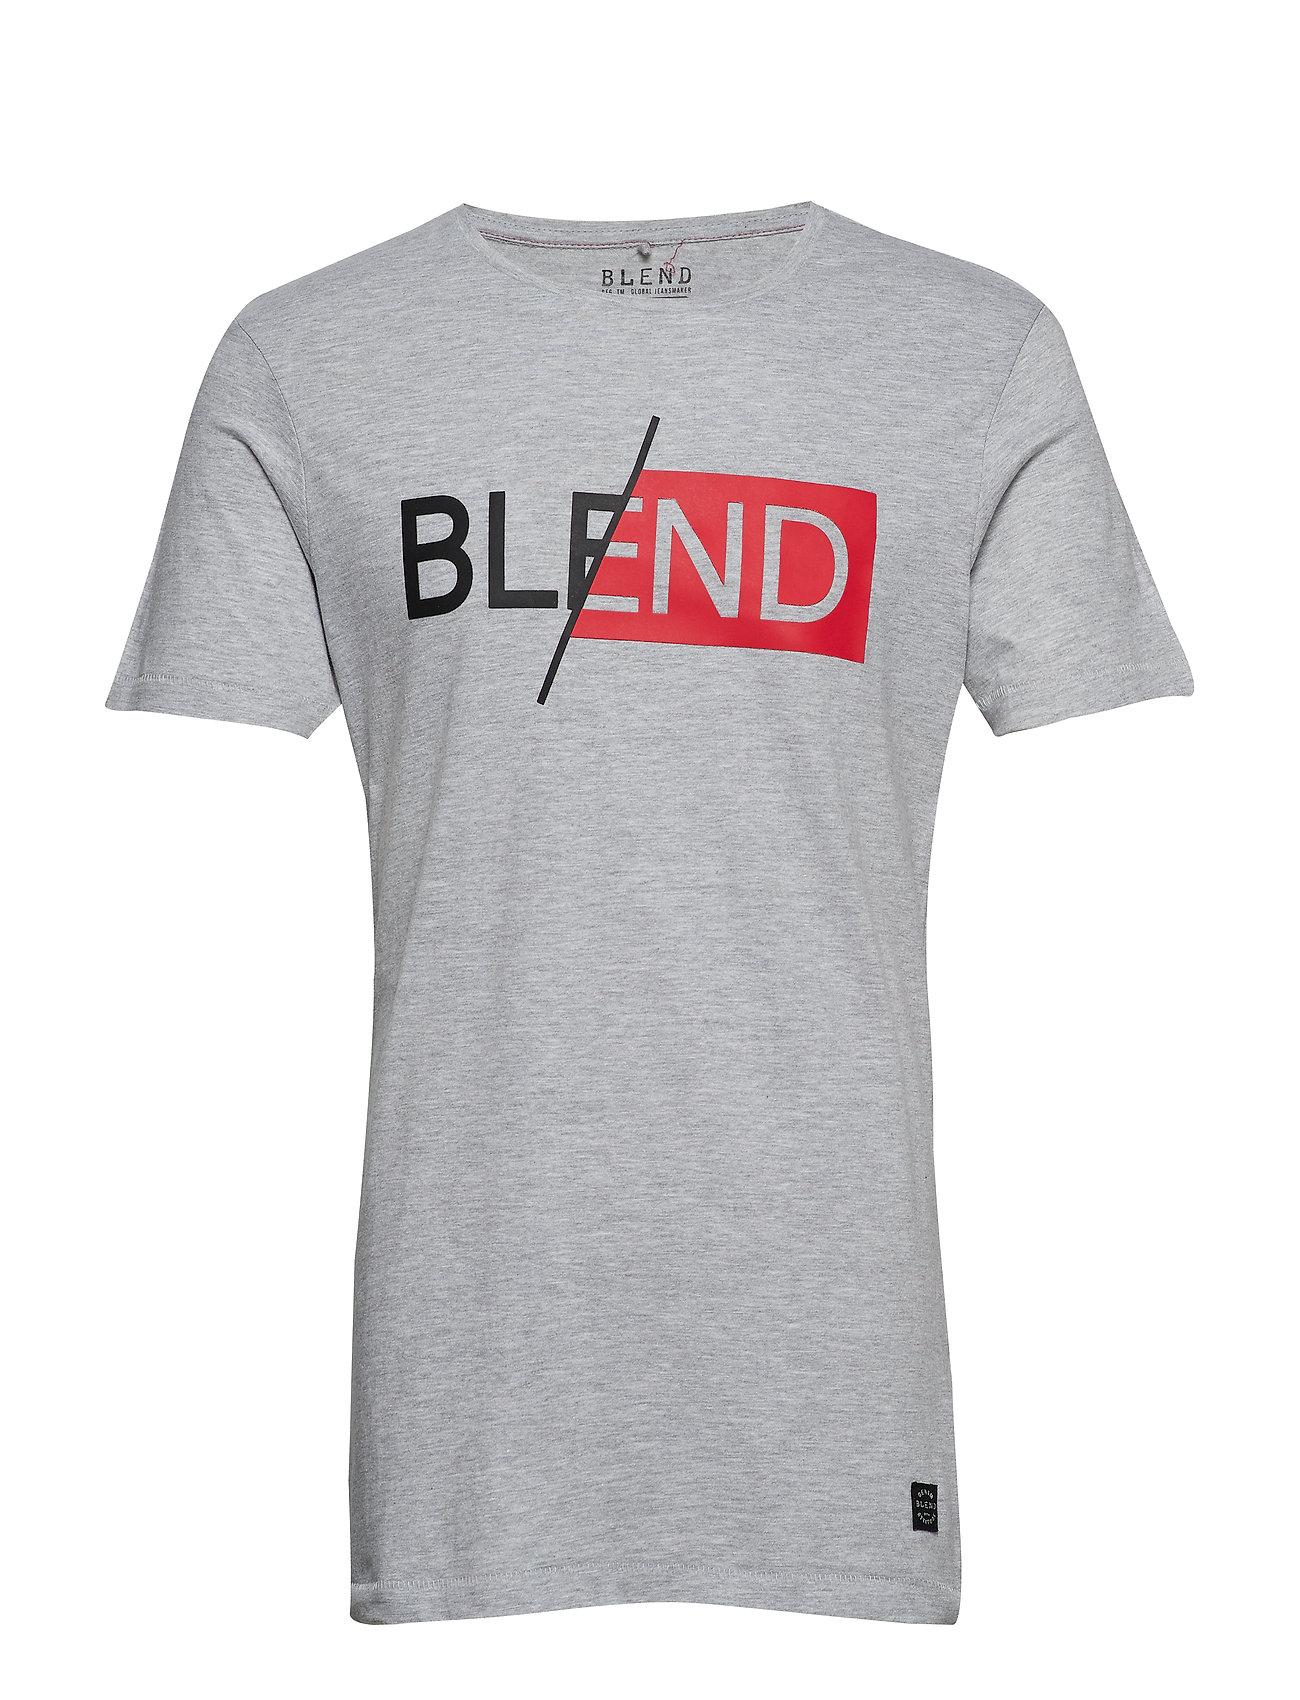 Blend Tee - STONE MIX